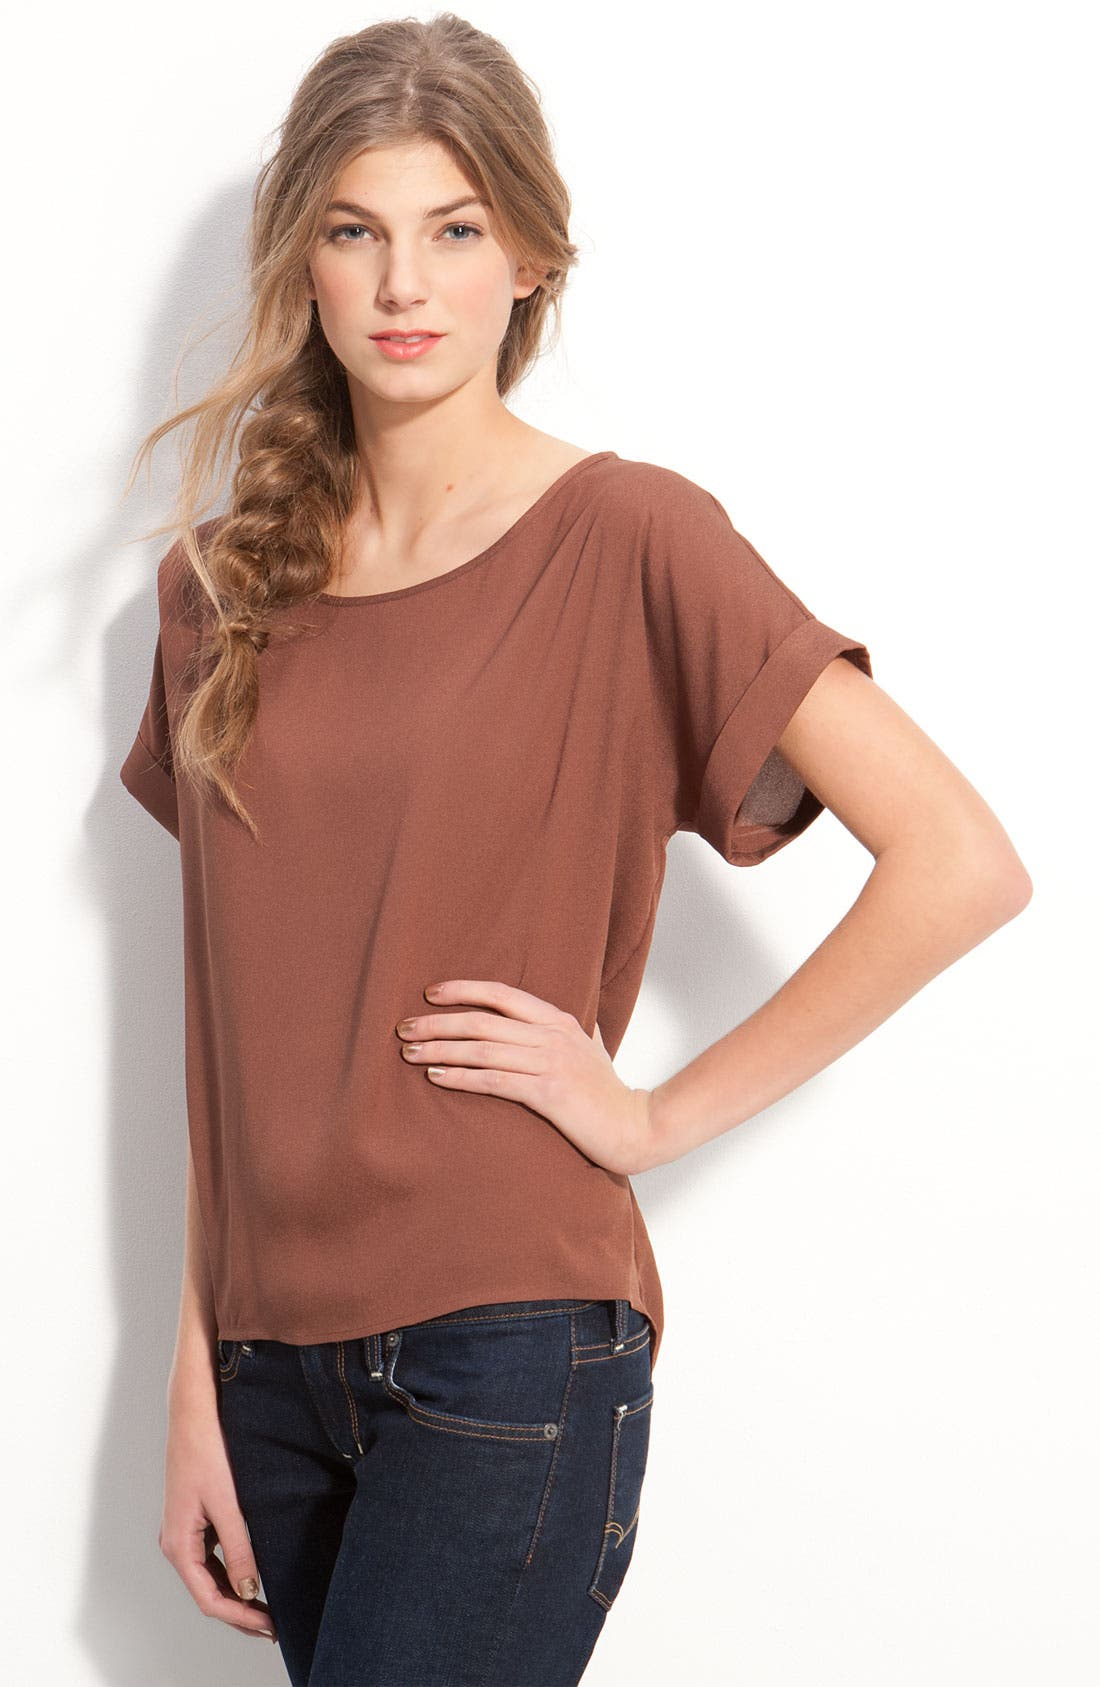 Main Image - Frenchi® Cuffed Short Sleeve Boxy Top (Juniors)